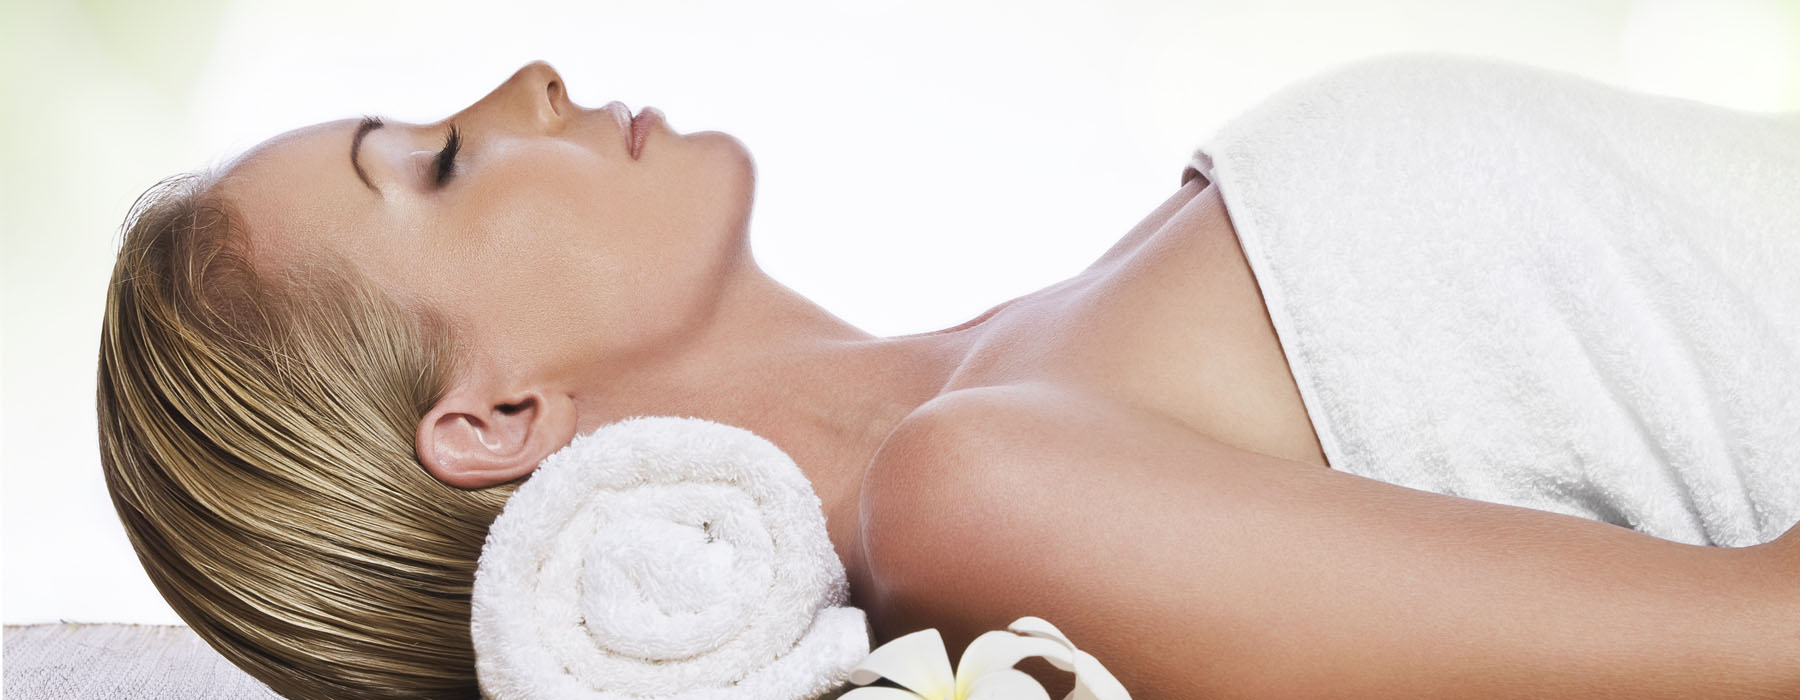 Baño con masaje sencillo